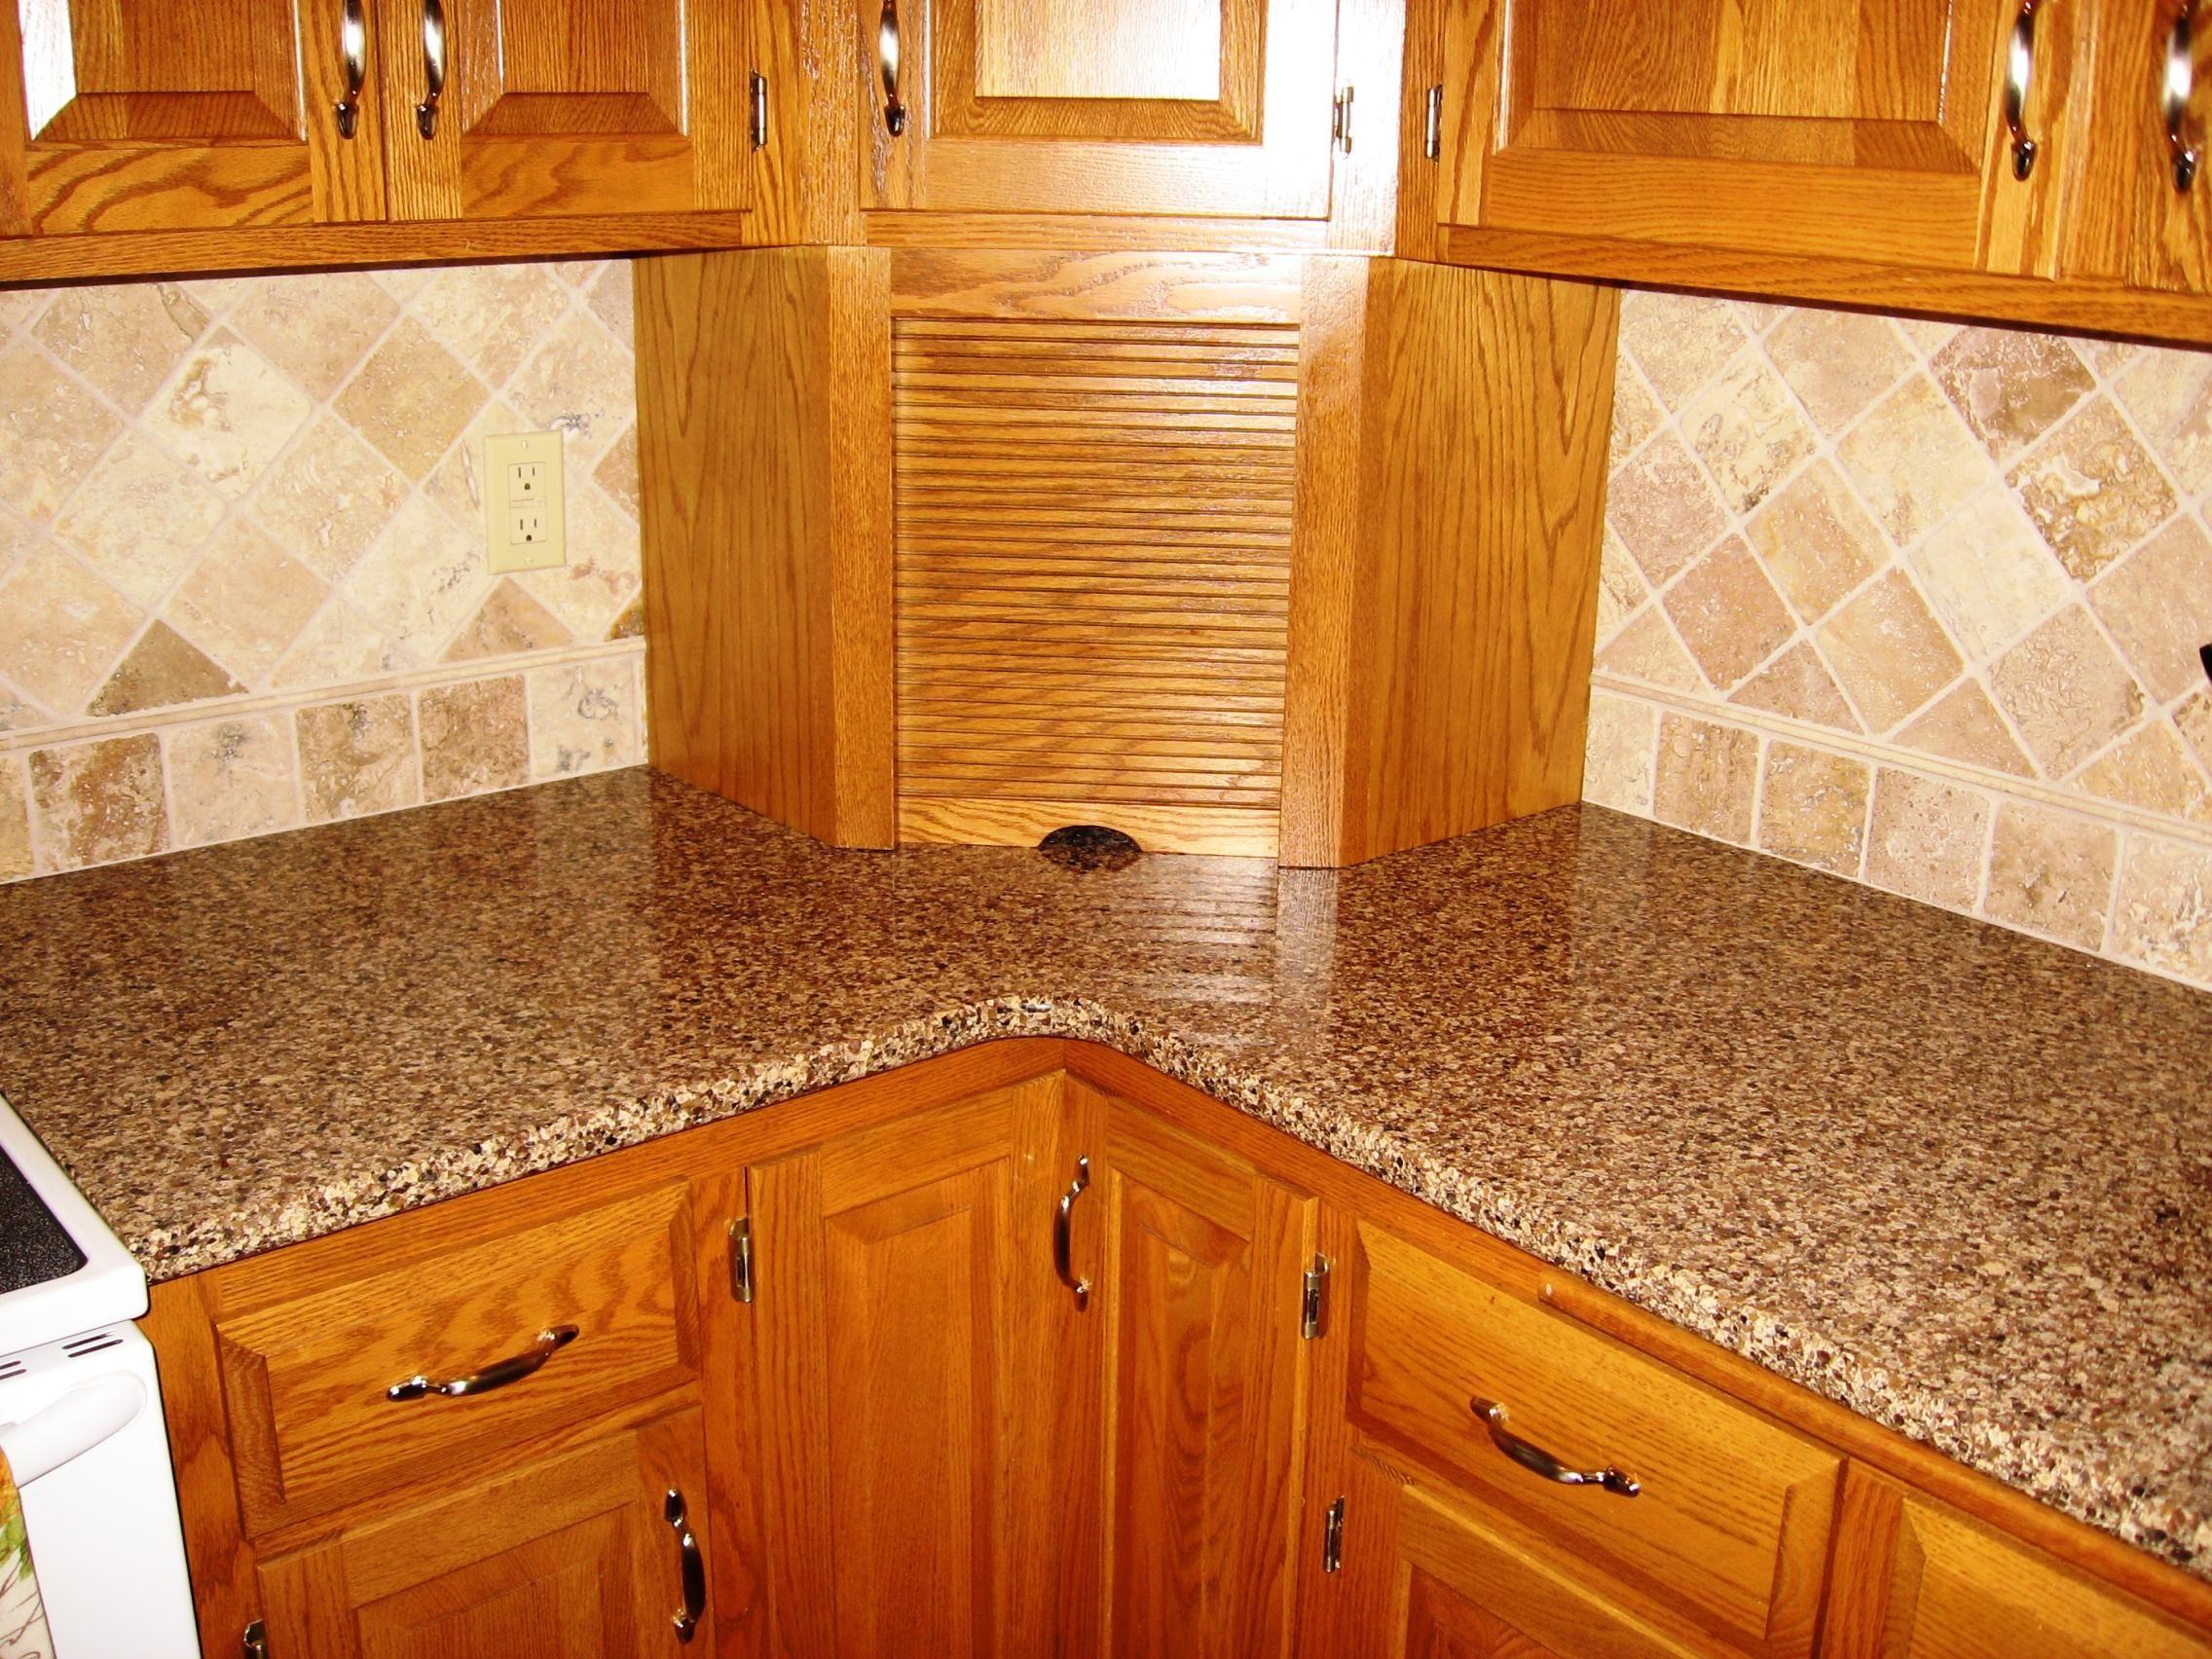 hardwood granite kitchen countertops caledonia granite counters in the kitchen Raw Silk Granite Kitchen Countertop